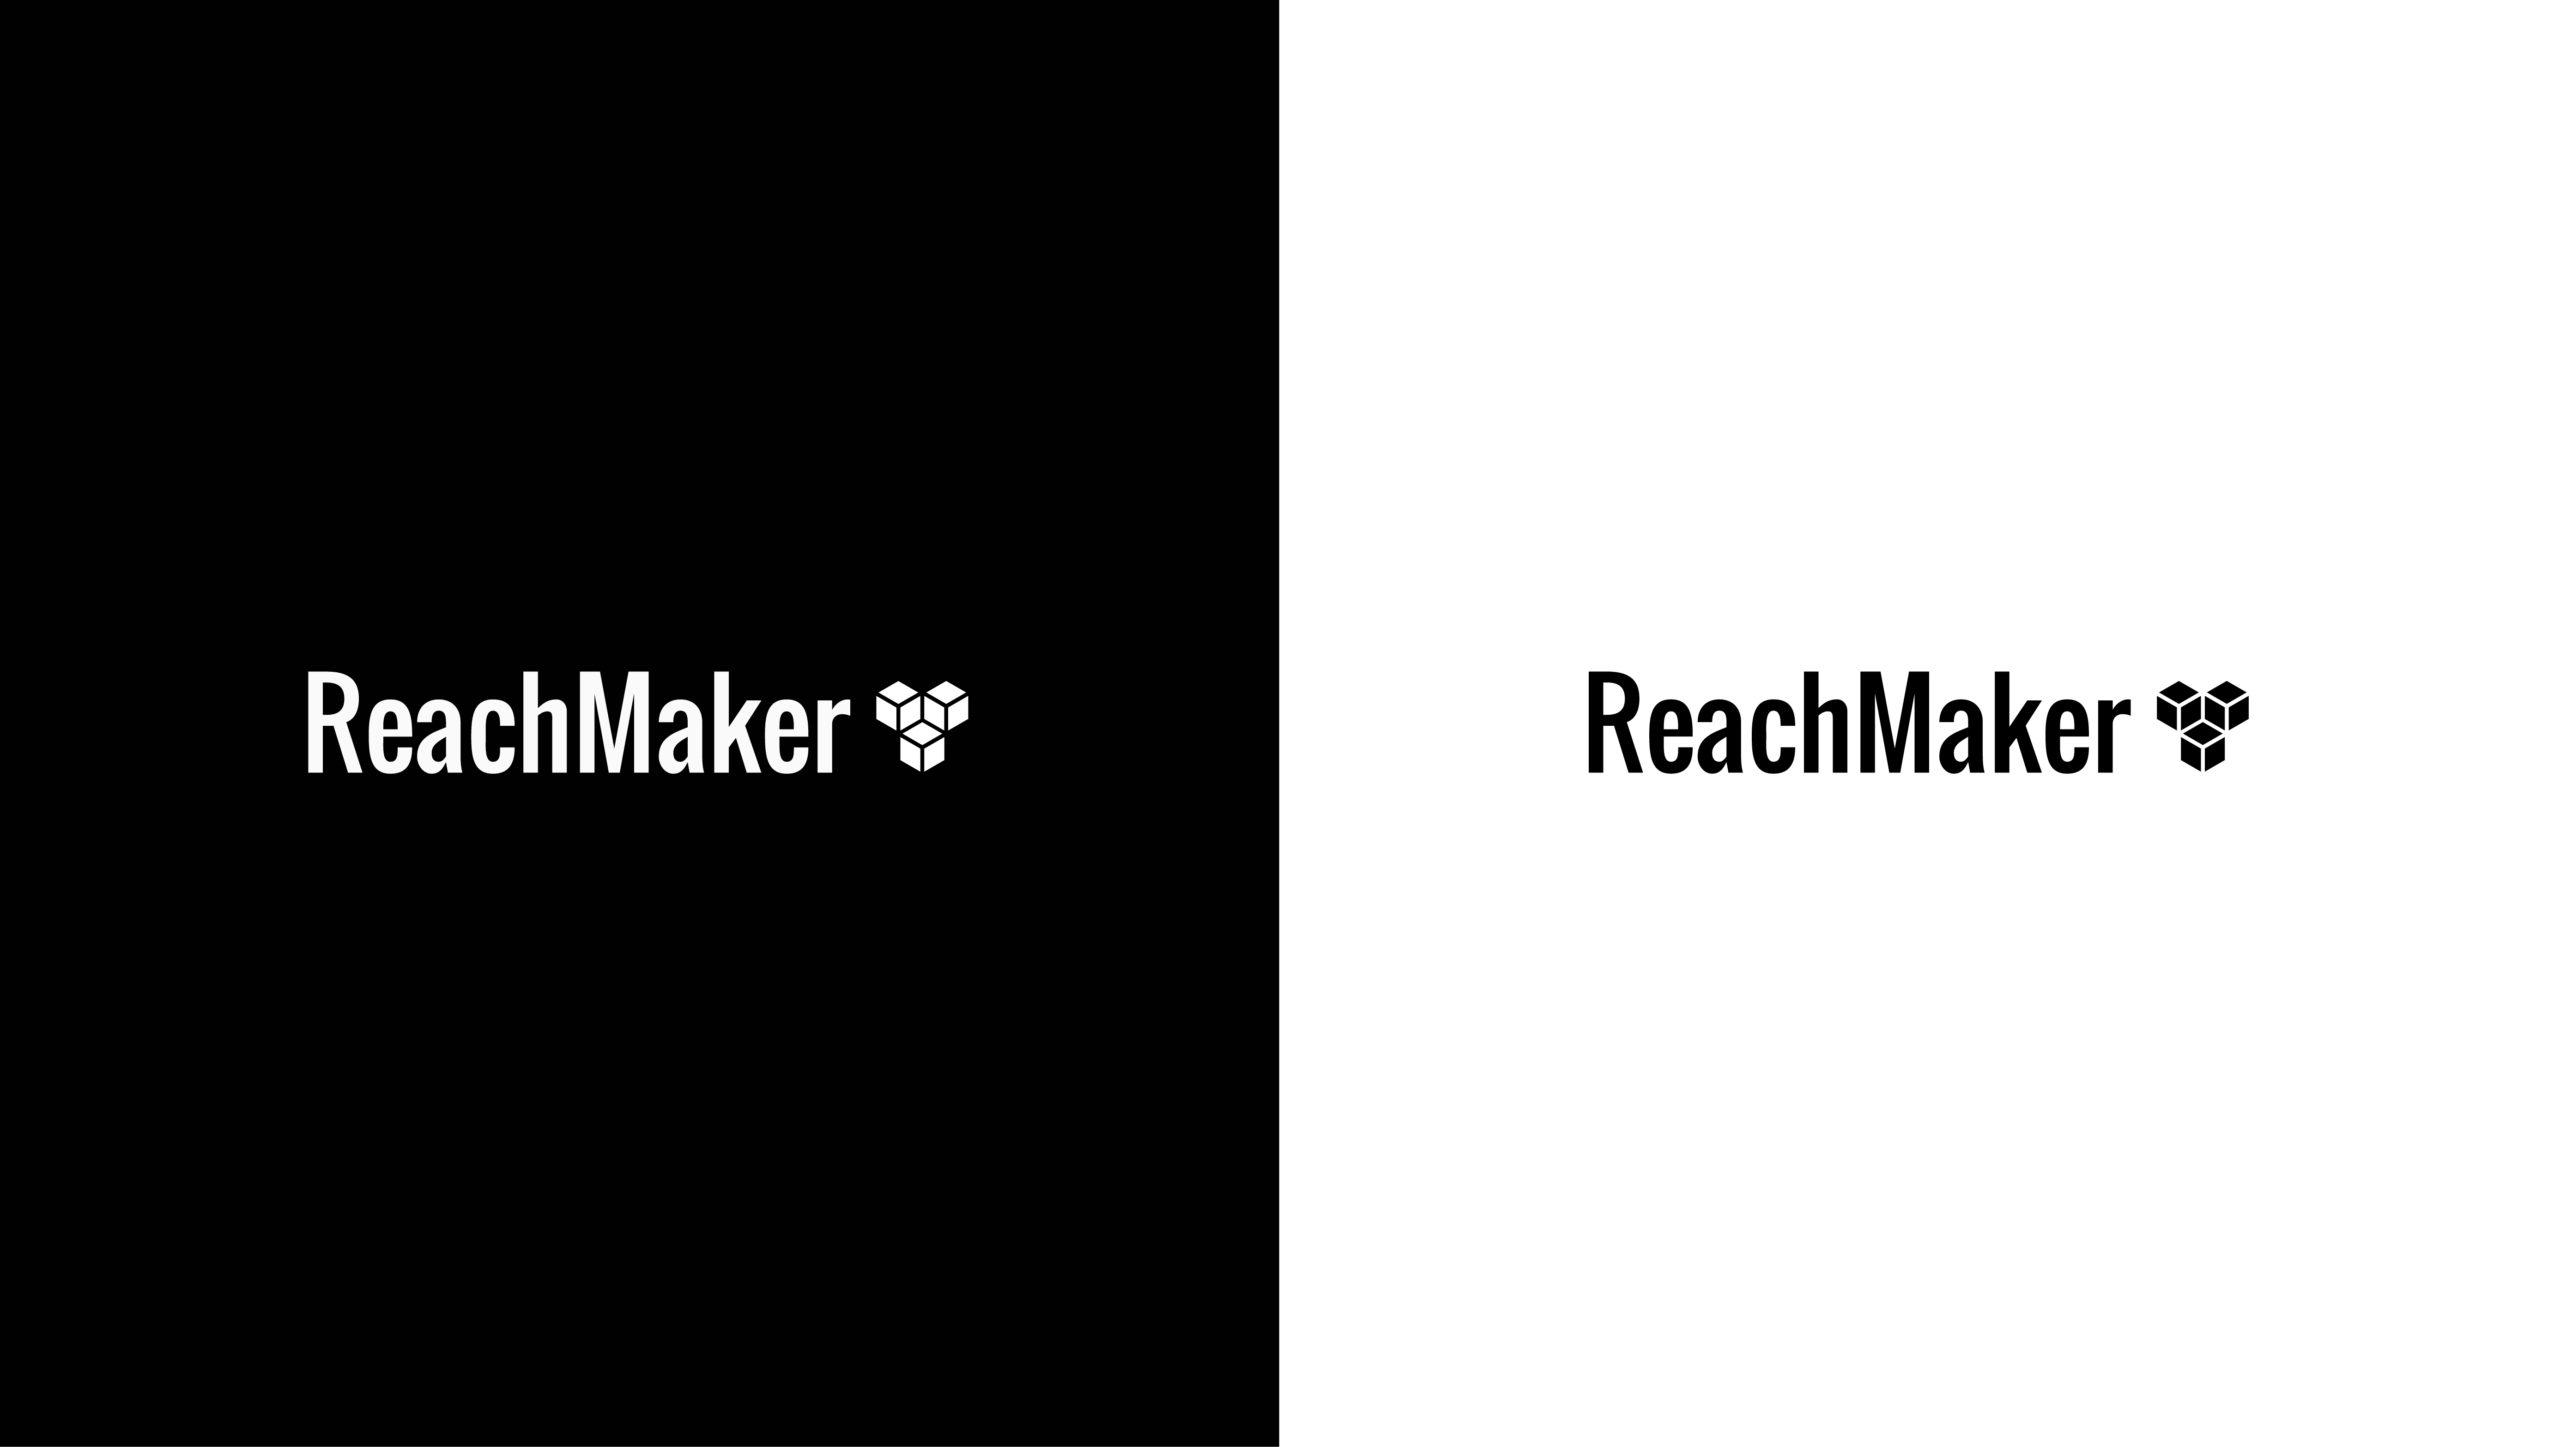 Mise_en_page_ReachMaker 2